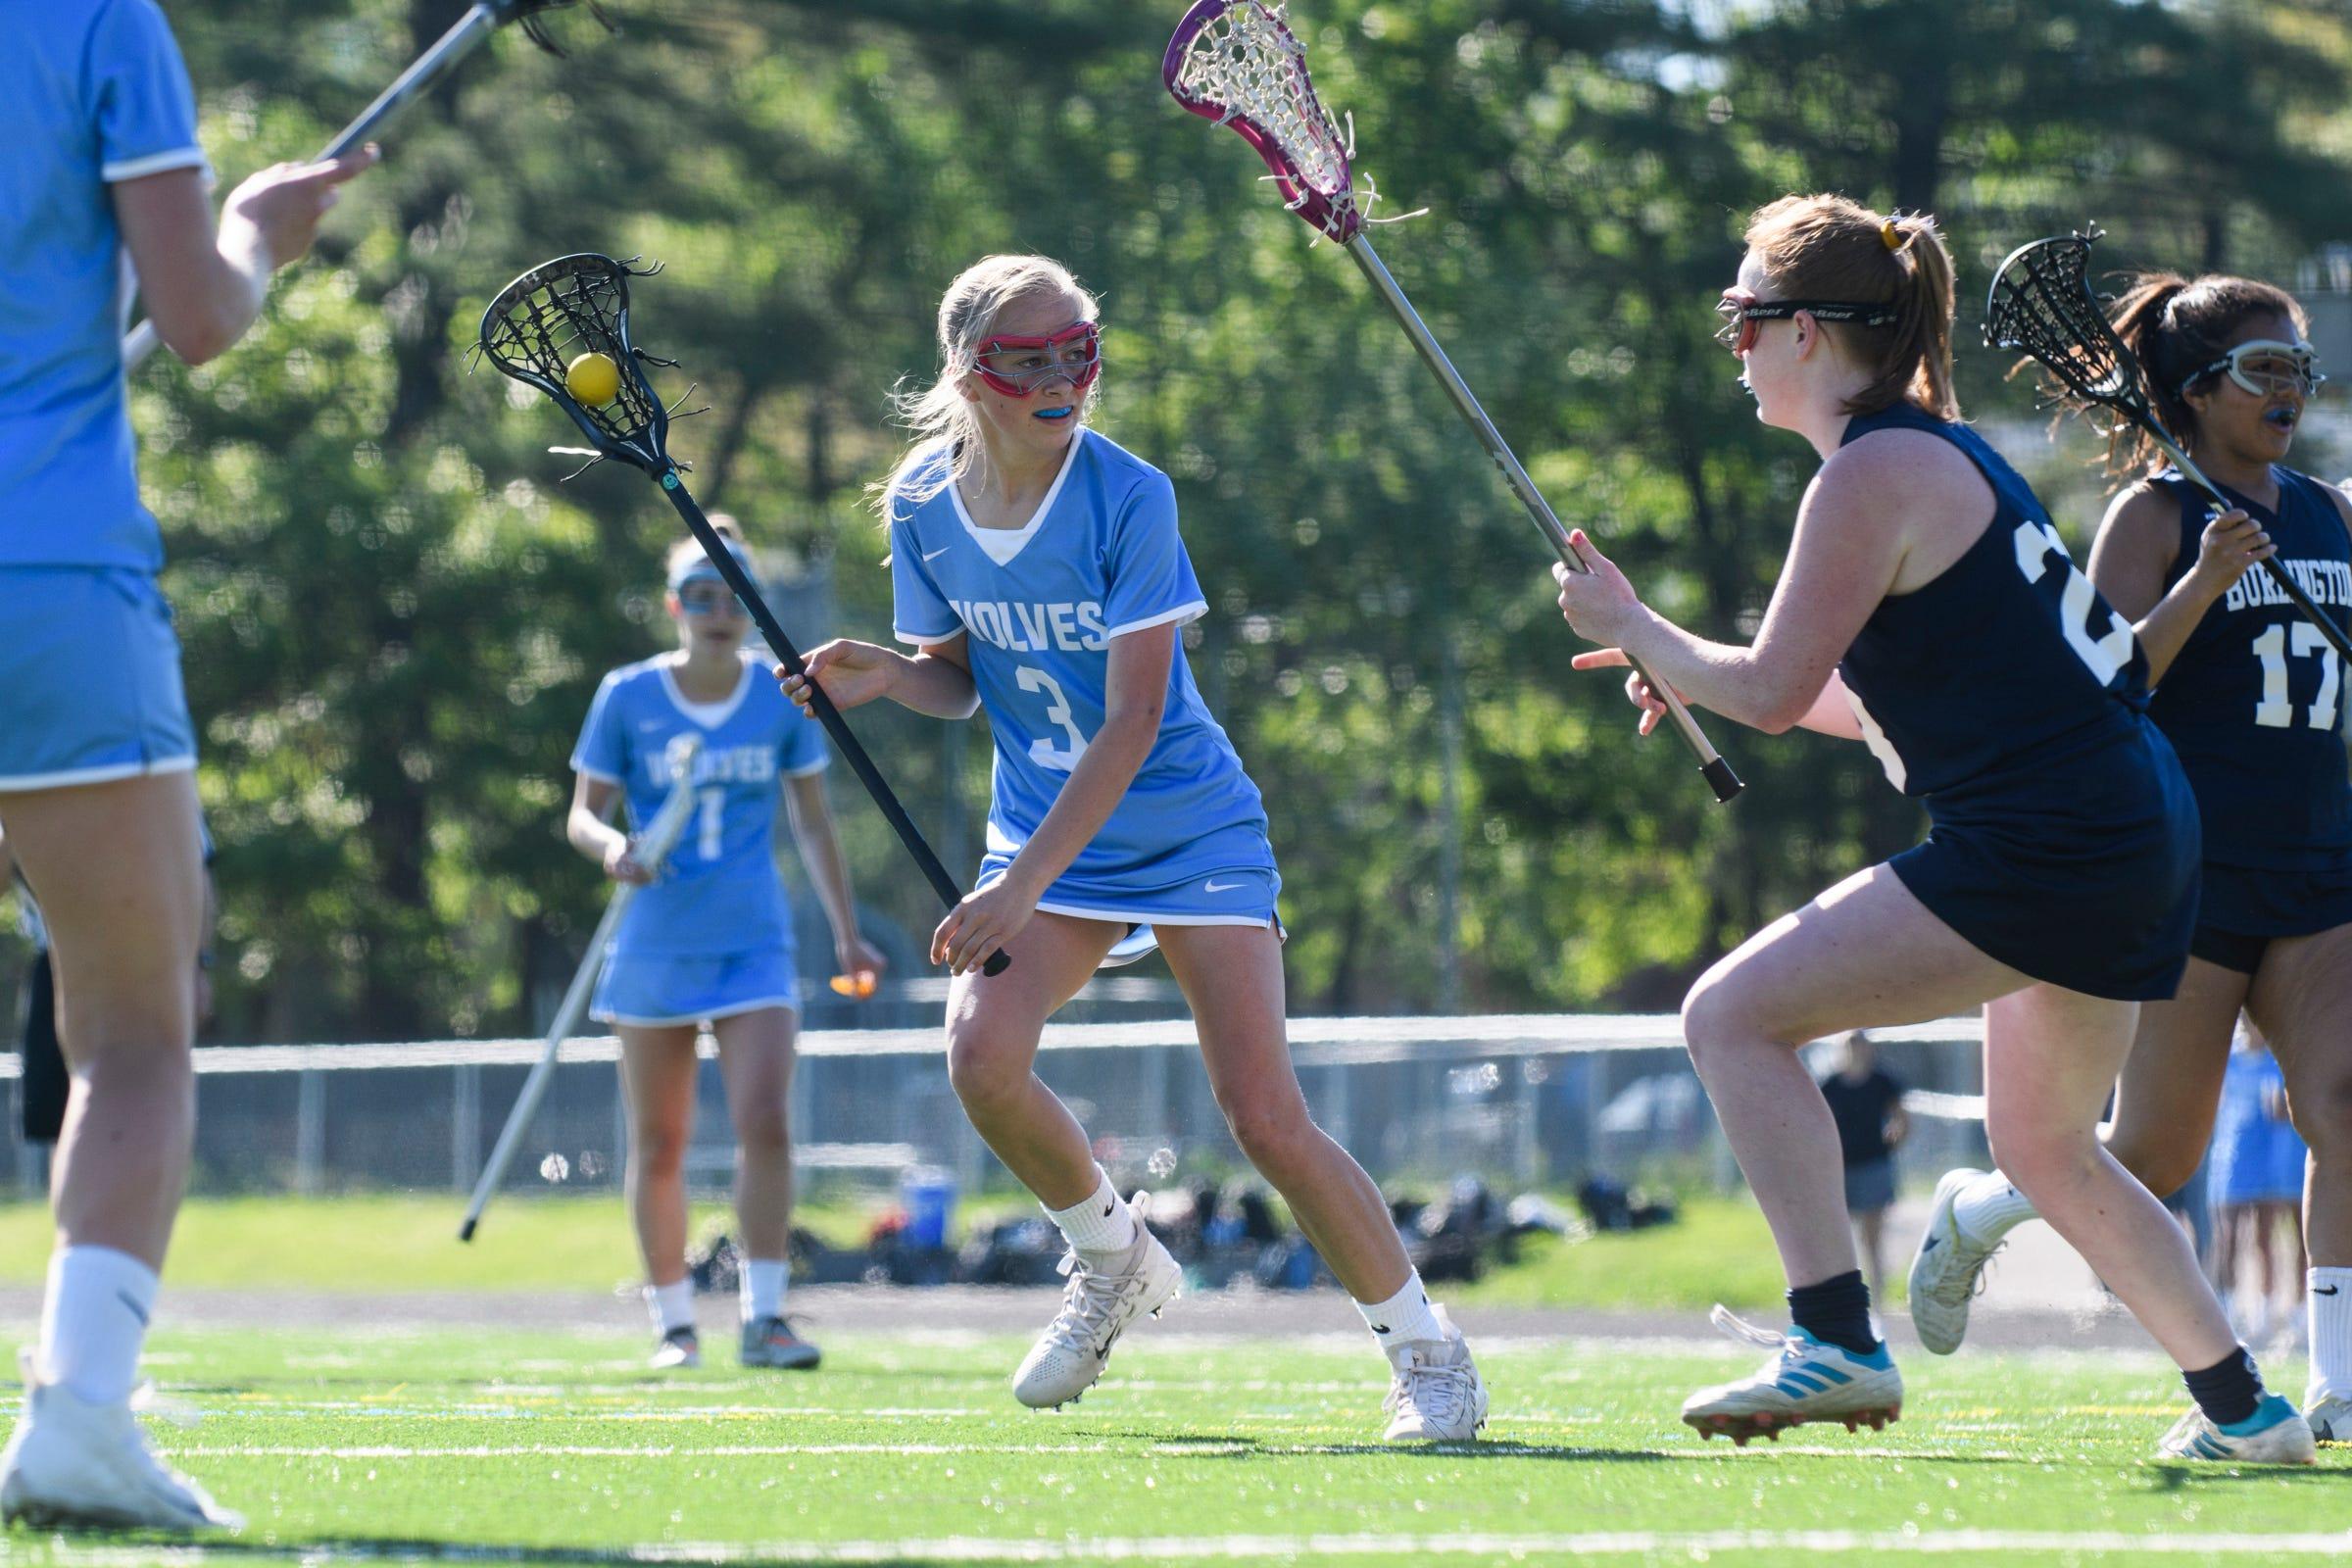 Saturday's highlights: Booth's OT winner lifts South Burlington girls lacrosse